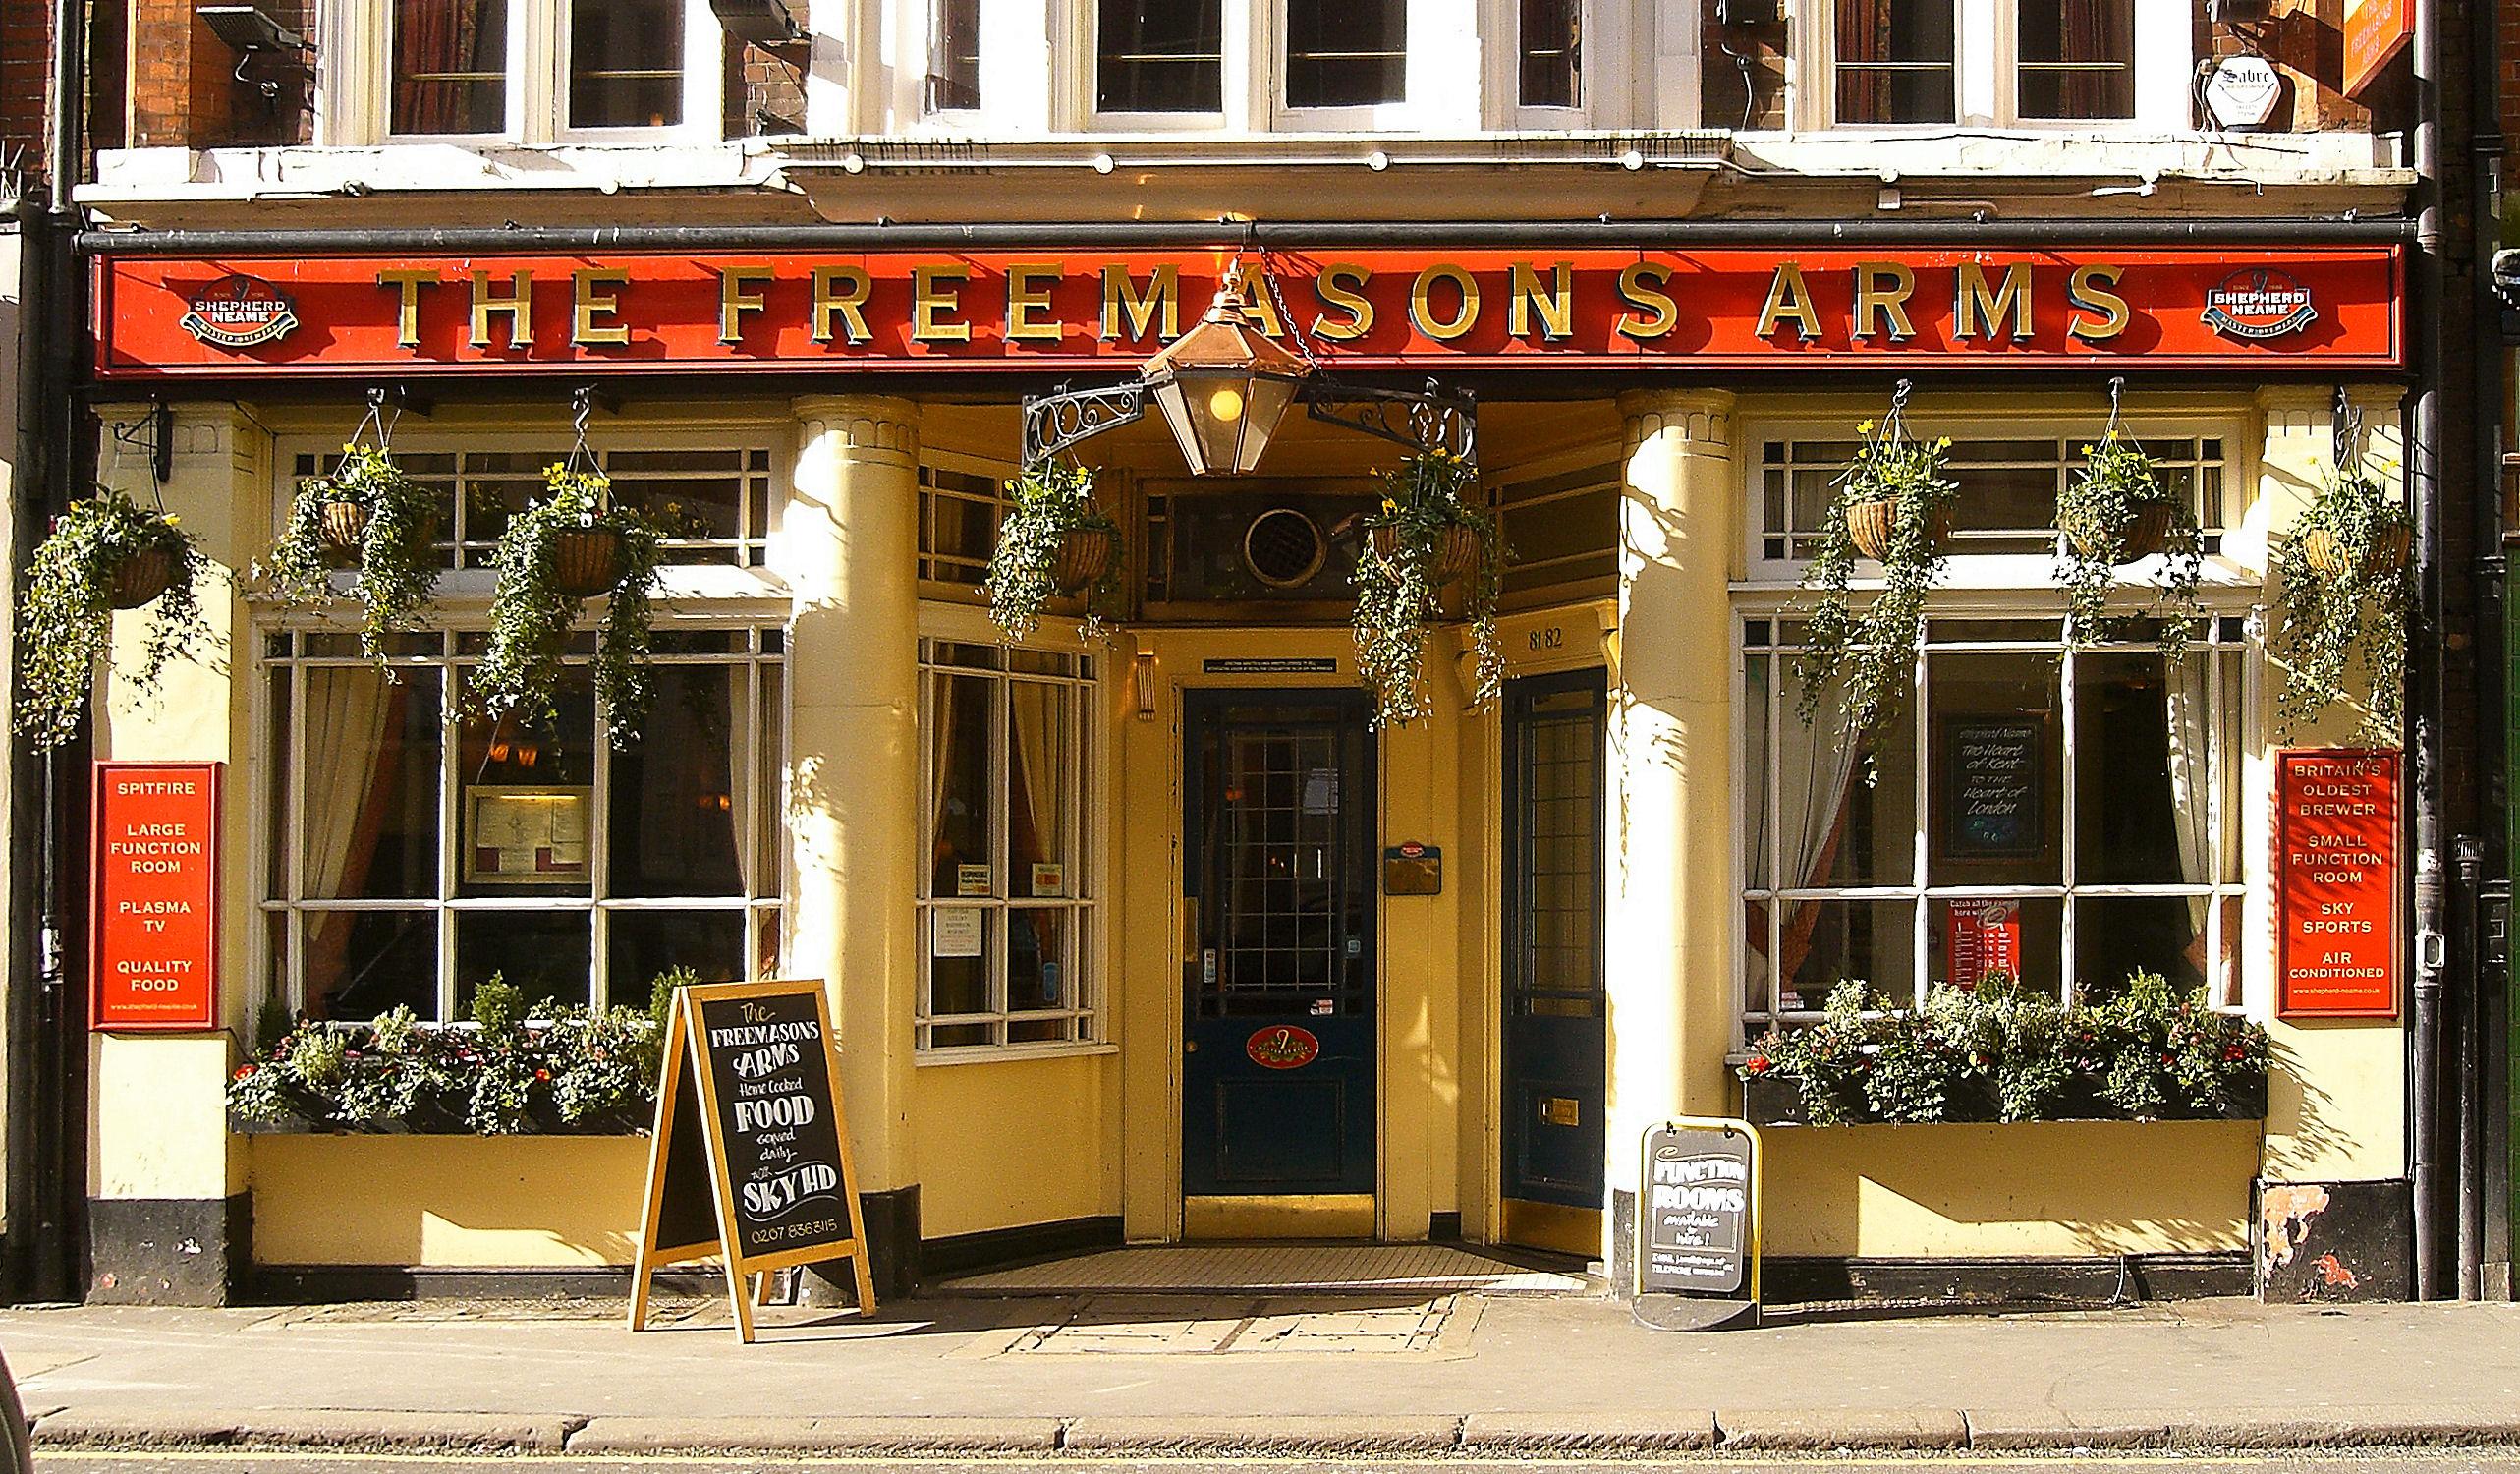 The Freemasons Arms